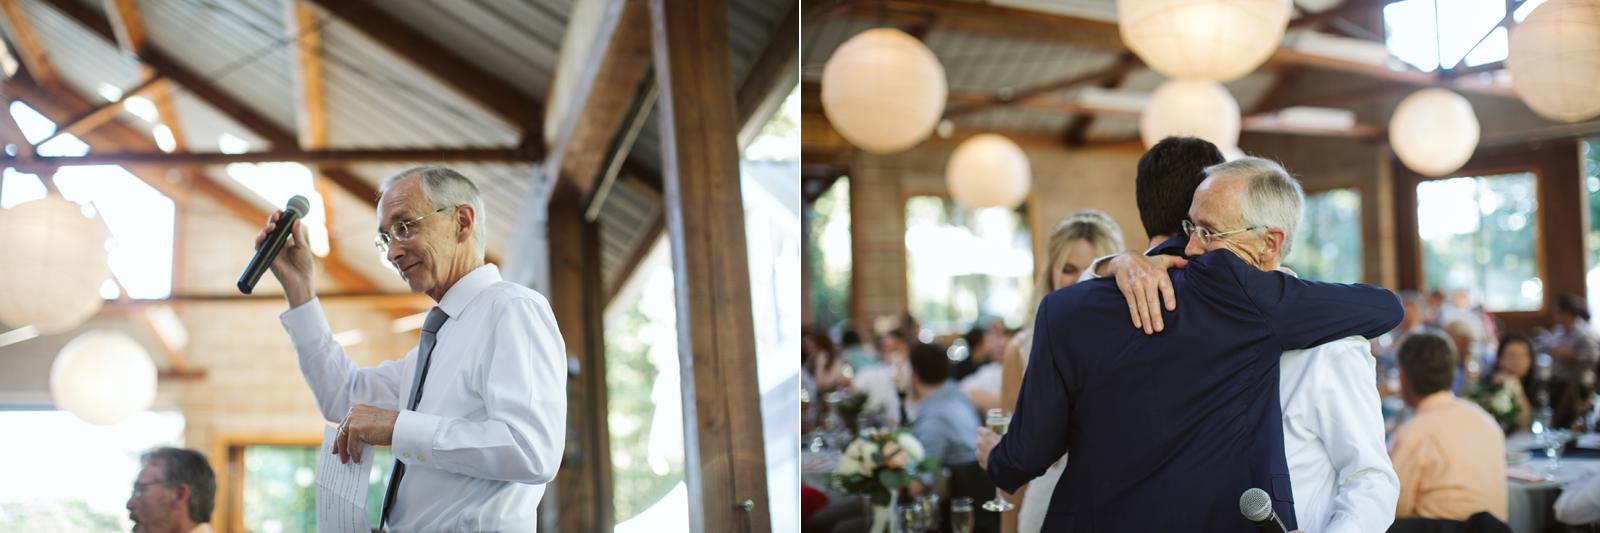 098-daronjackson-rachel-michael-wedding-mtpisgah.jpg